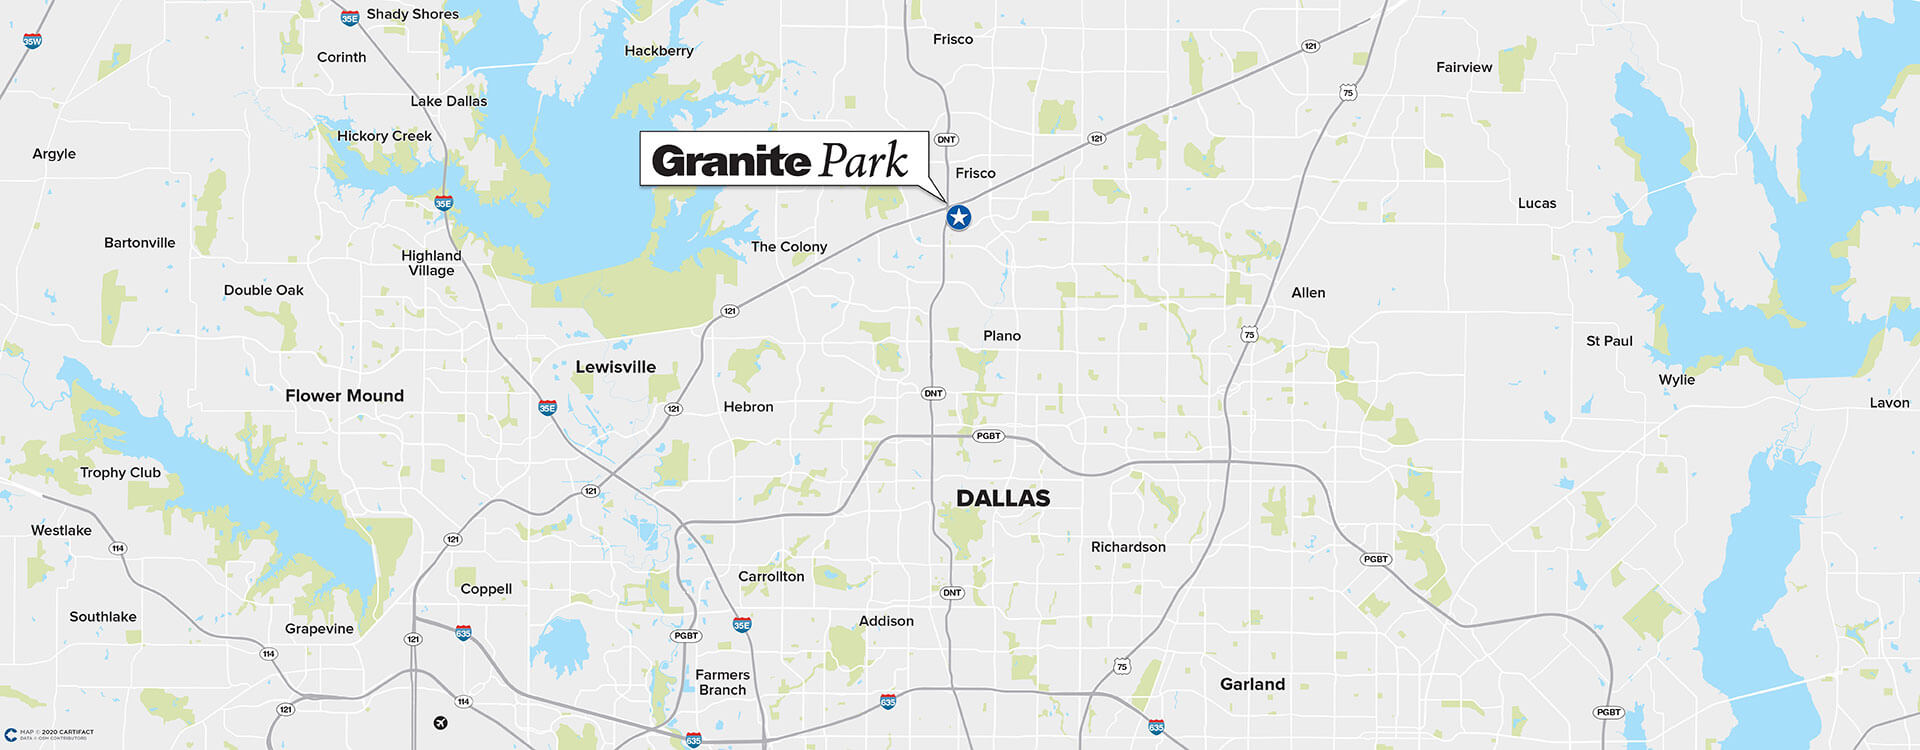 Granite Park Five location map